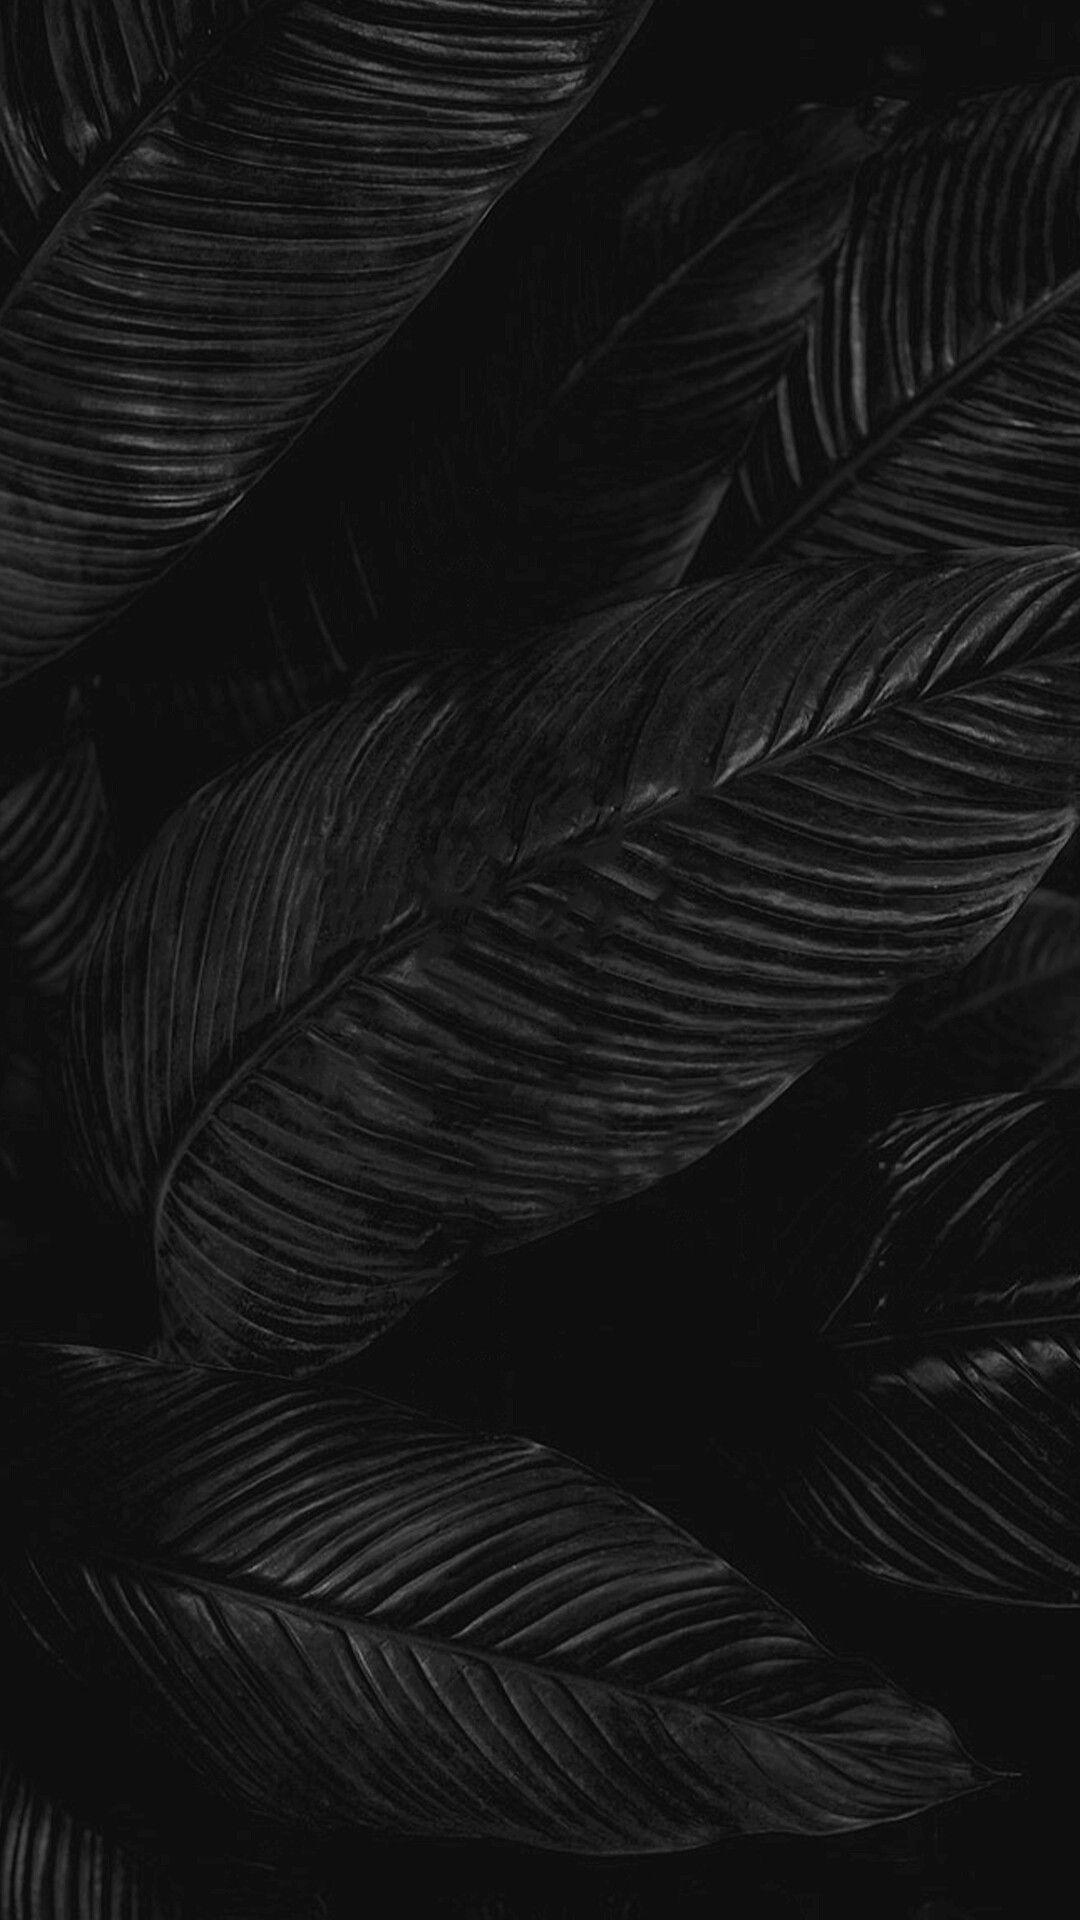 blackwallpaperiphone Black phone wallpaper, Black